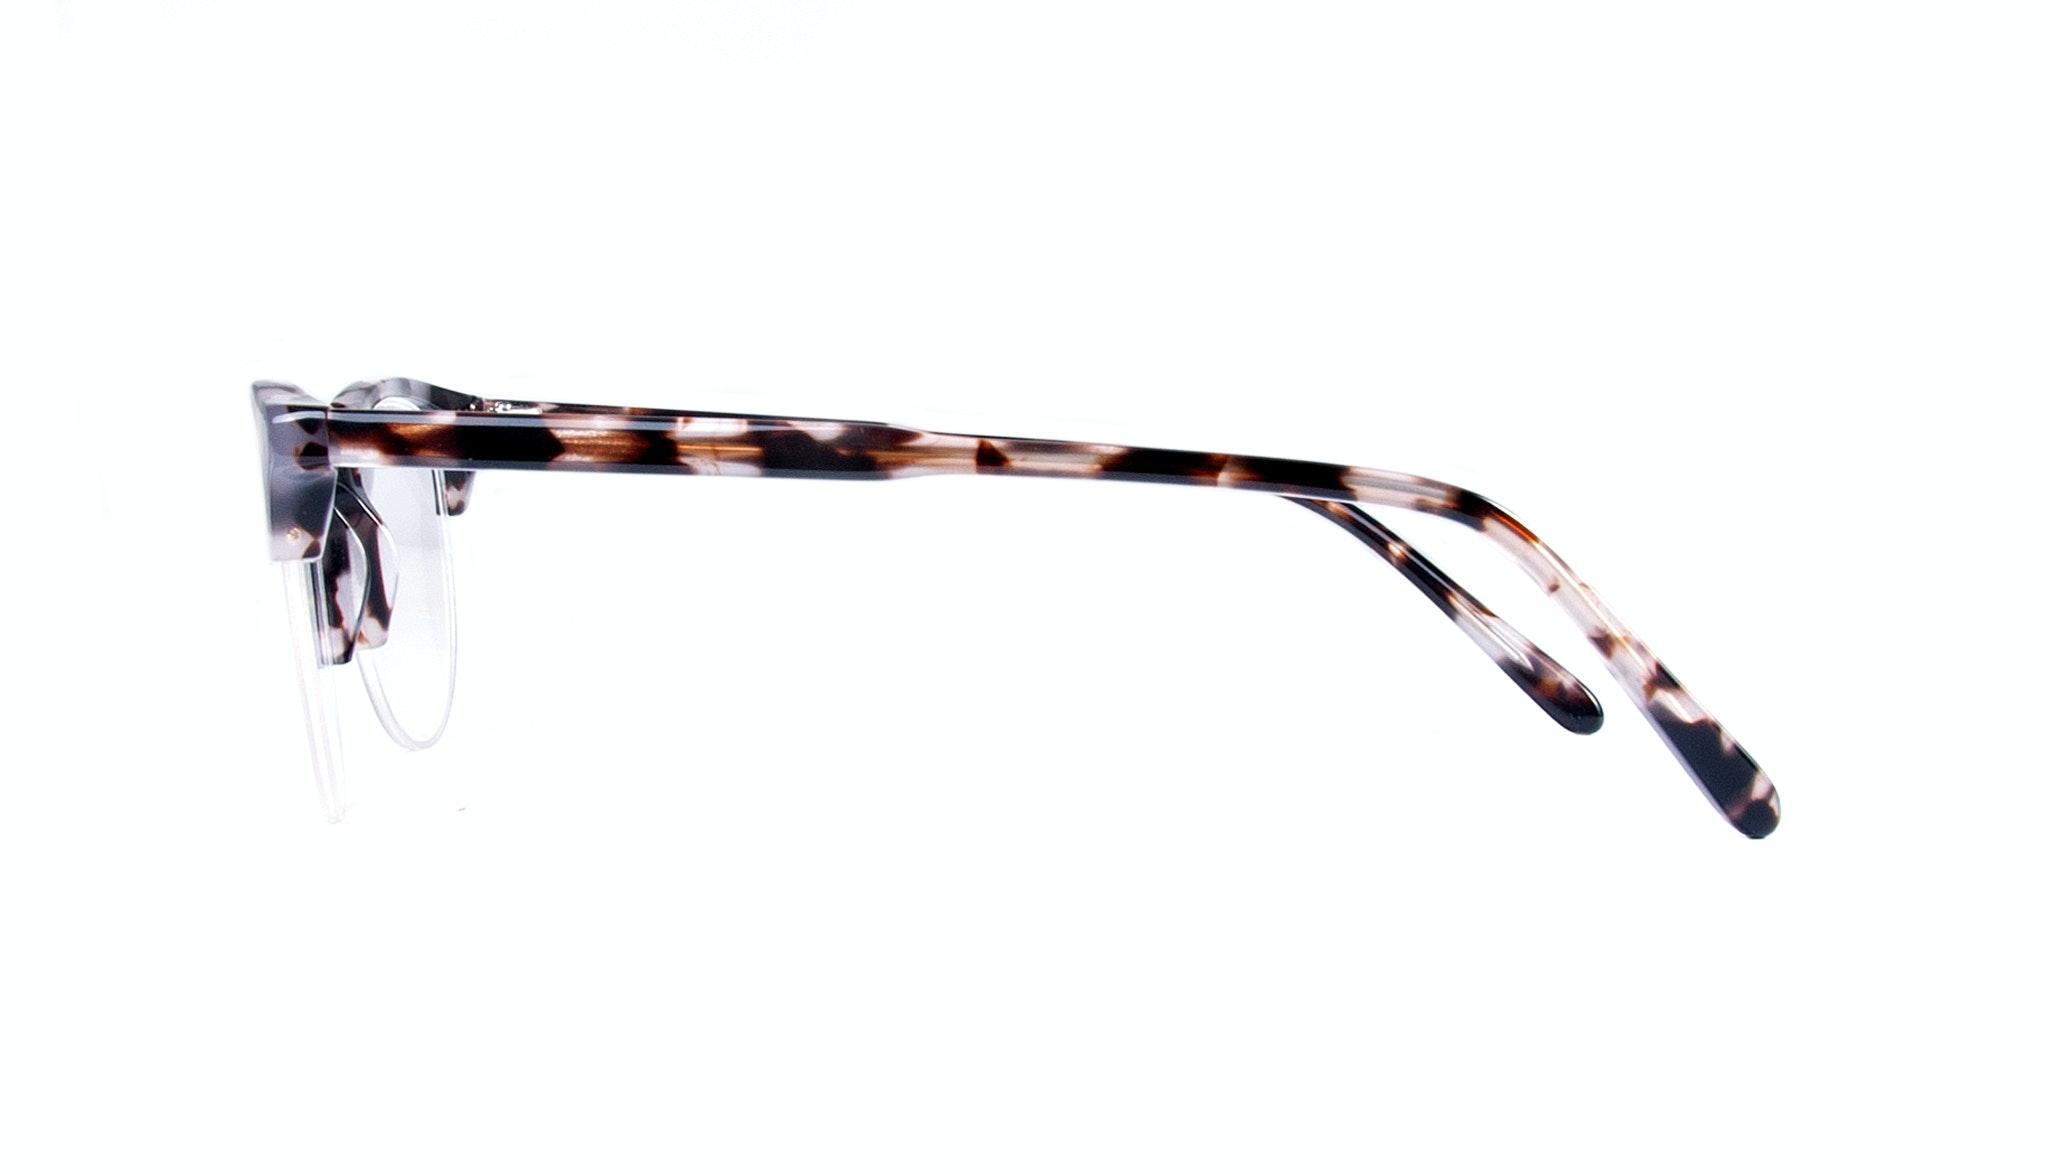 Affordable Fashion Glasses Round Semi-Rimless Eyeglasses Men Women Cult Light Mocha Tortoise Side